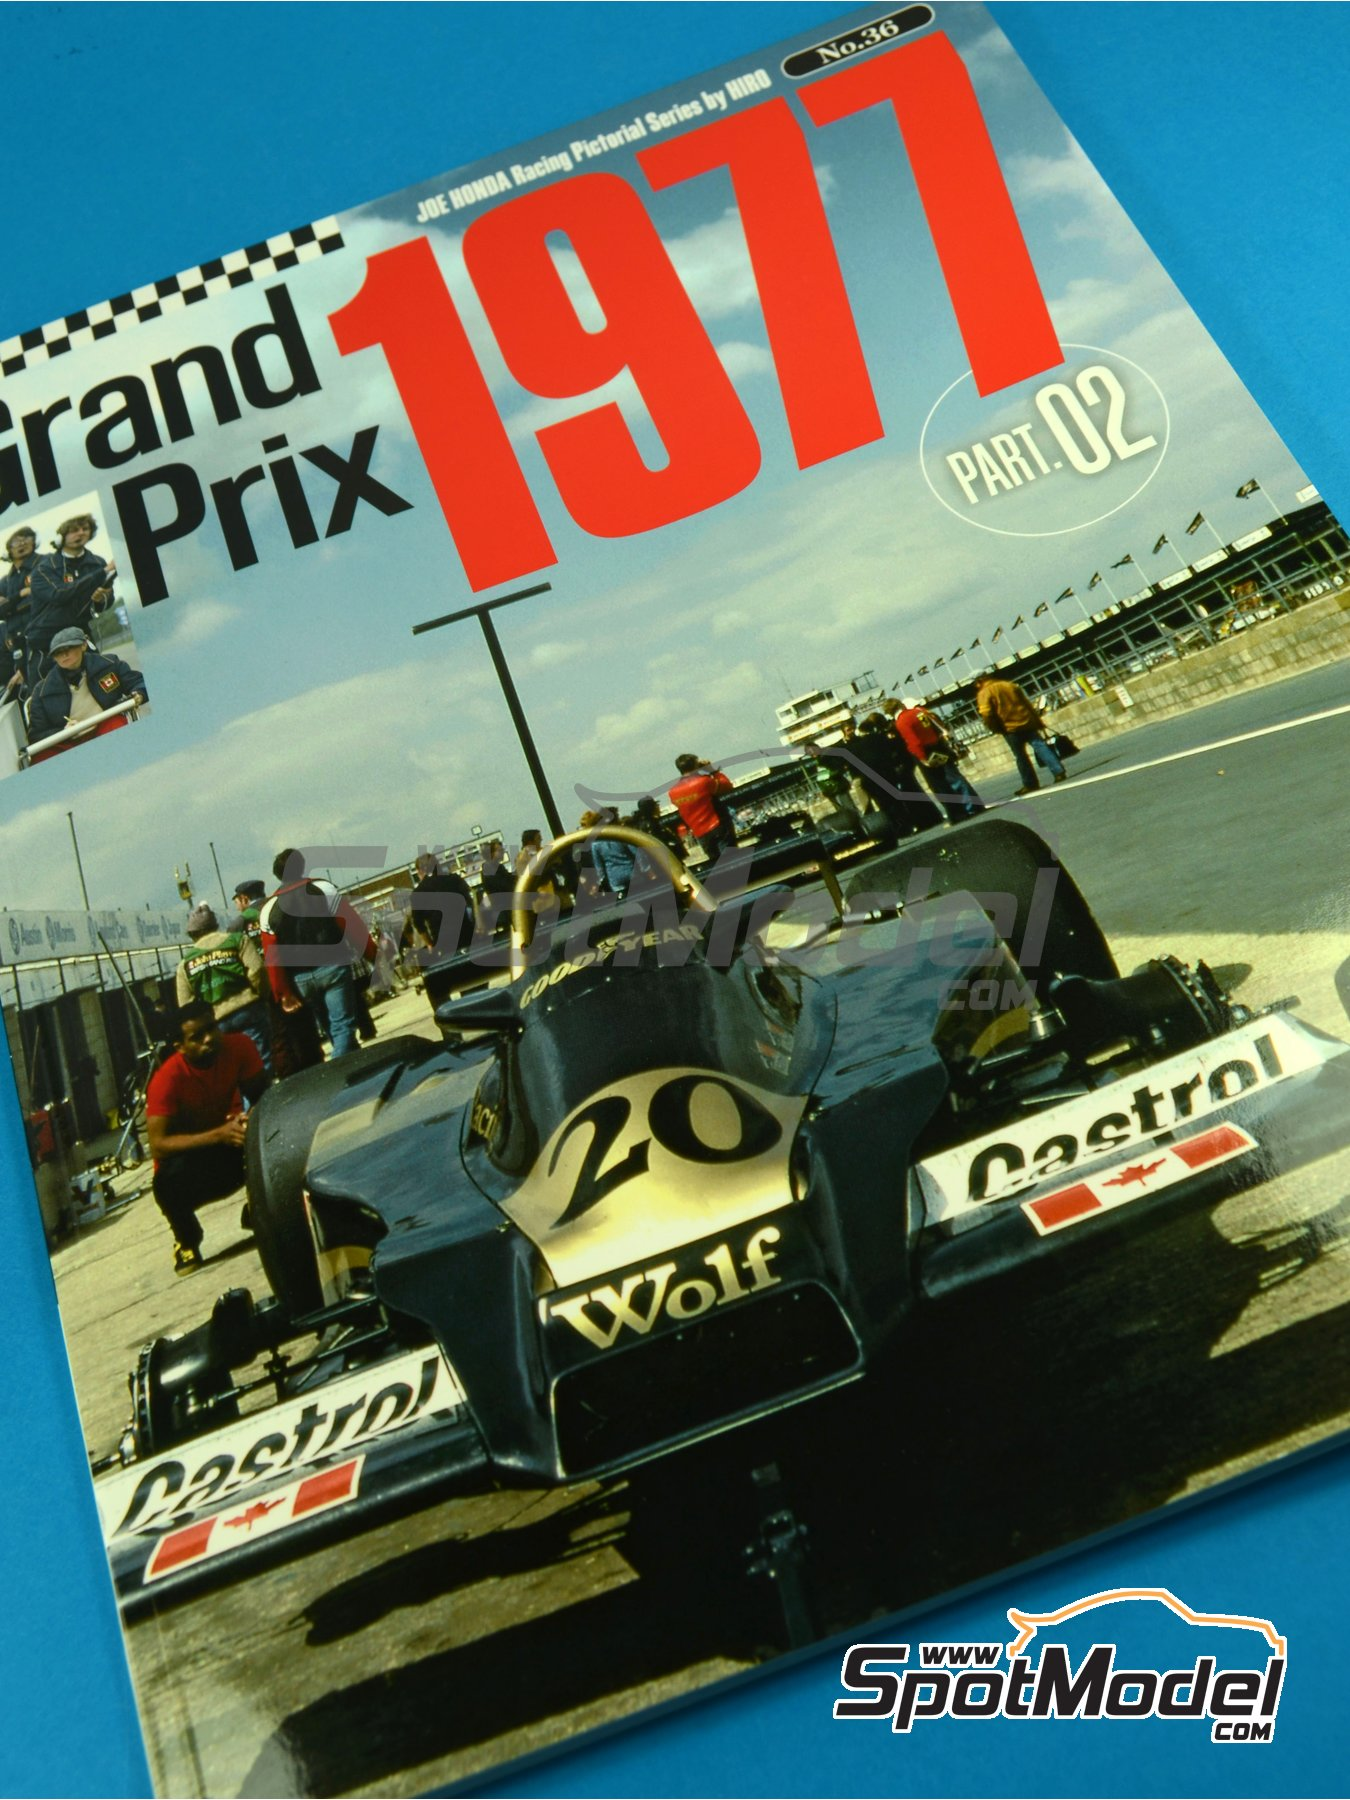 JOE HONDA Racing Pictorial Series - Grand Prix 1977, Part 02 | Reference / walkaround book manufactured by Model Factory Hiro (ref.MFH-JH36) image